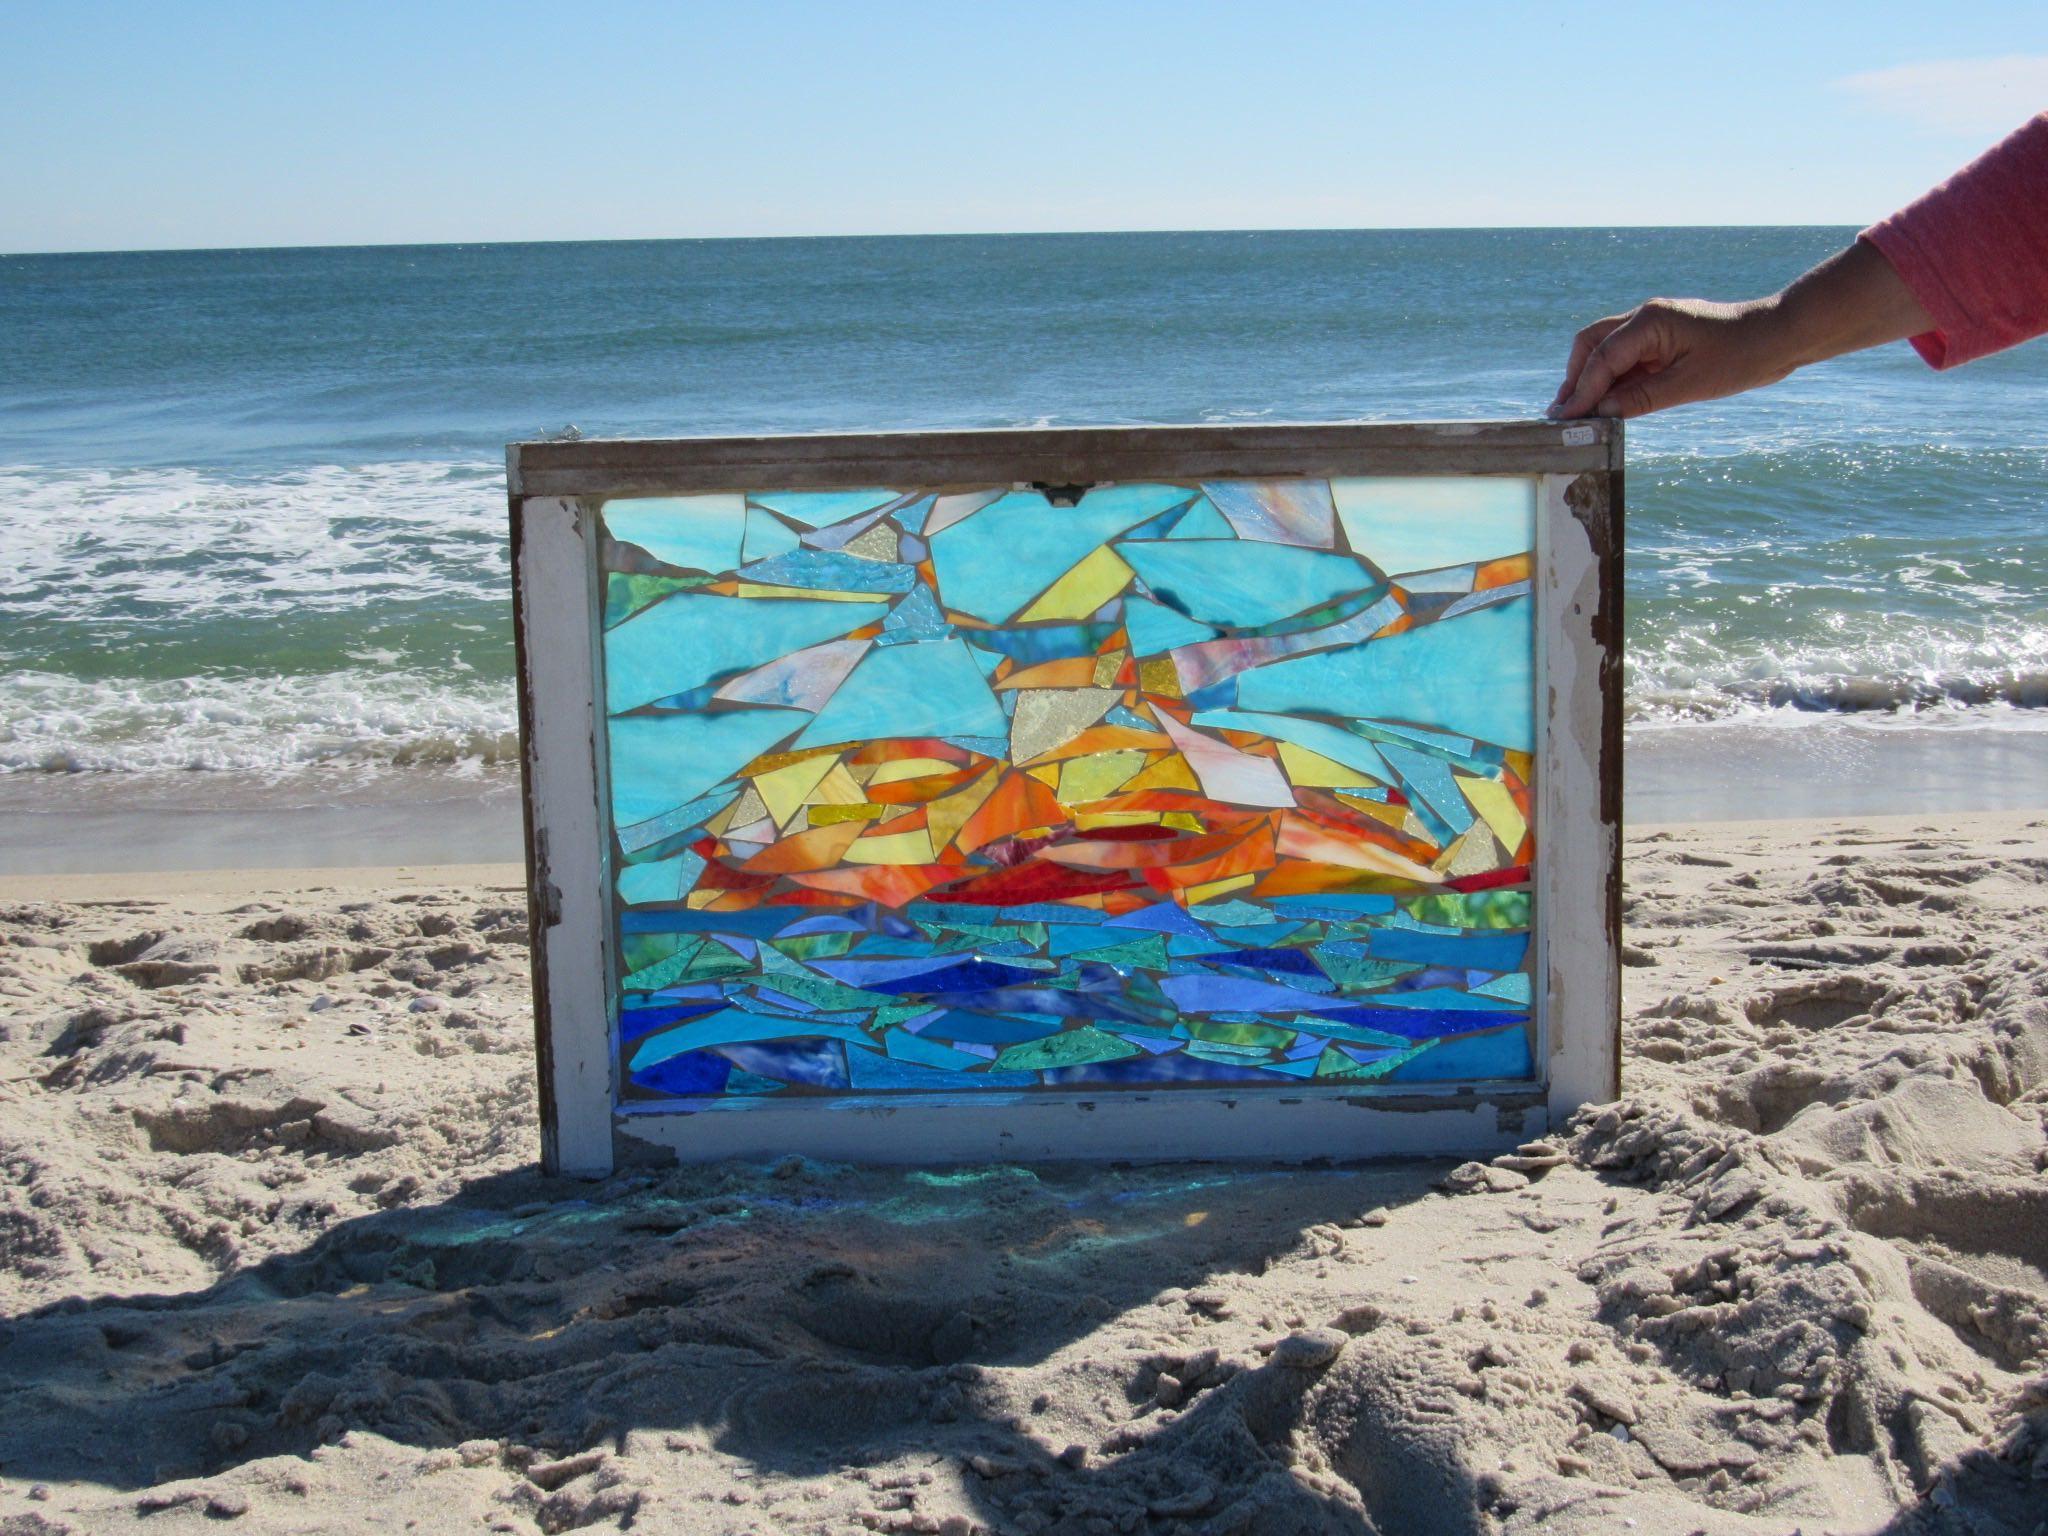 Mosaic on Glass Window-Sunrise 2.jpg